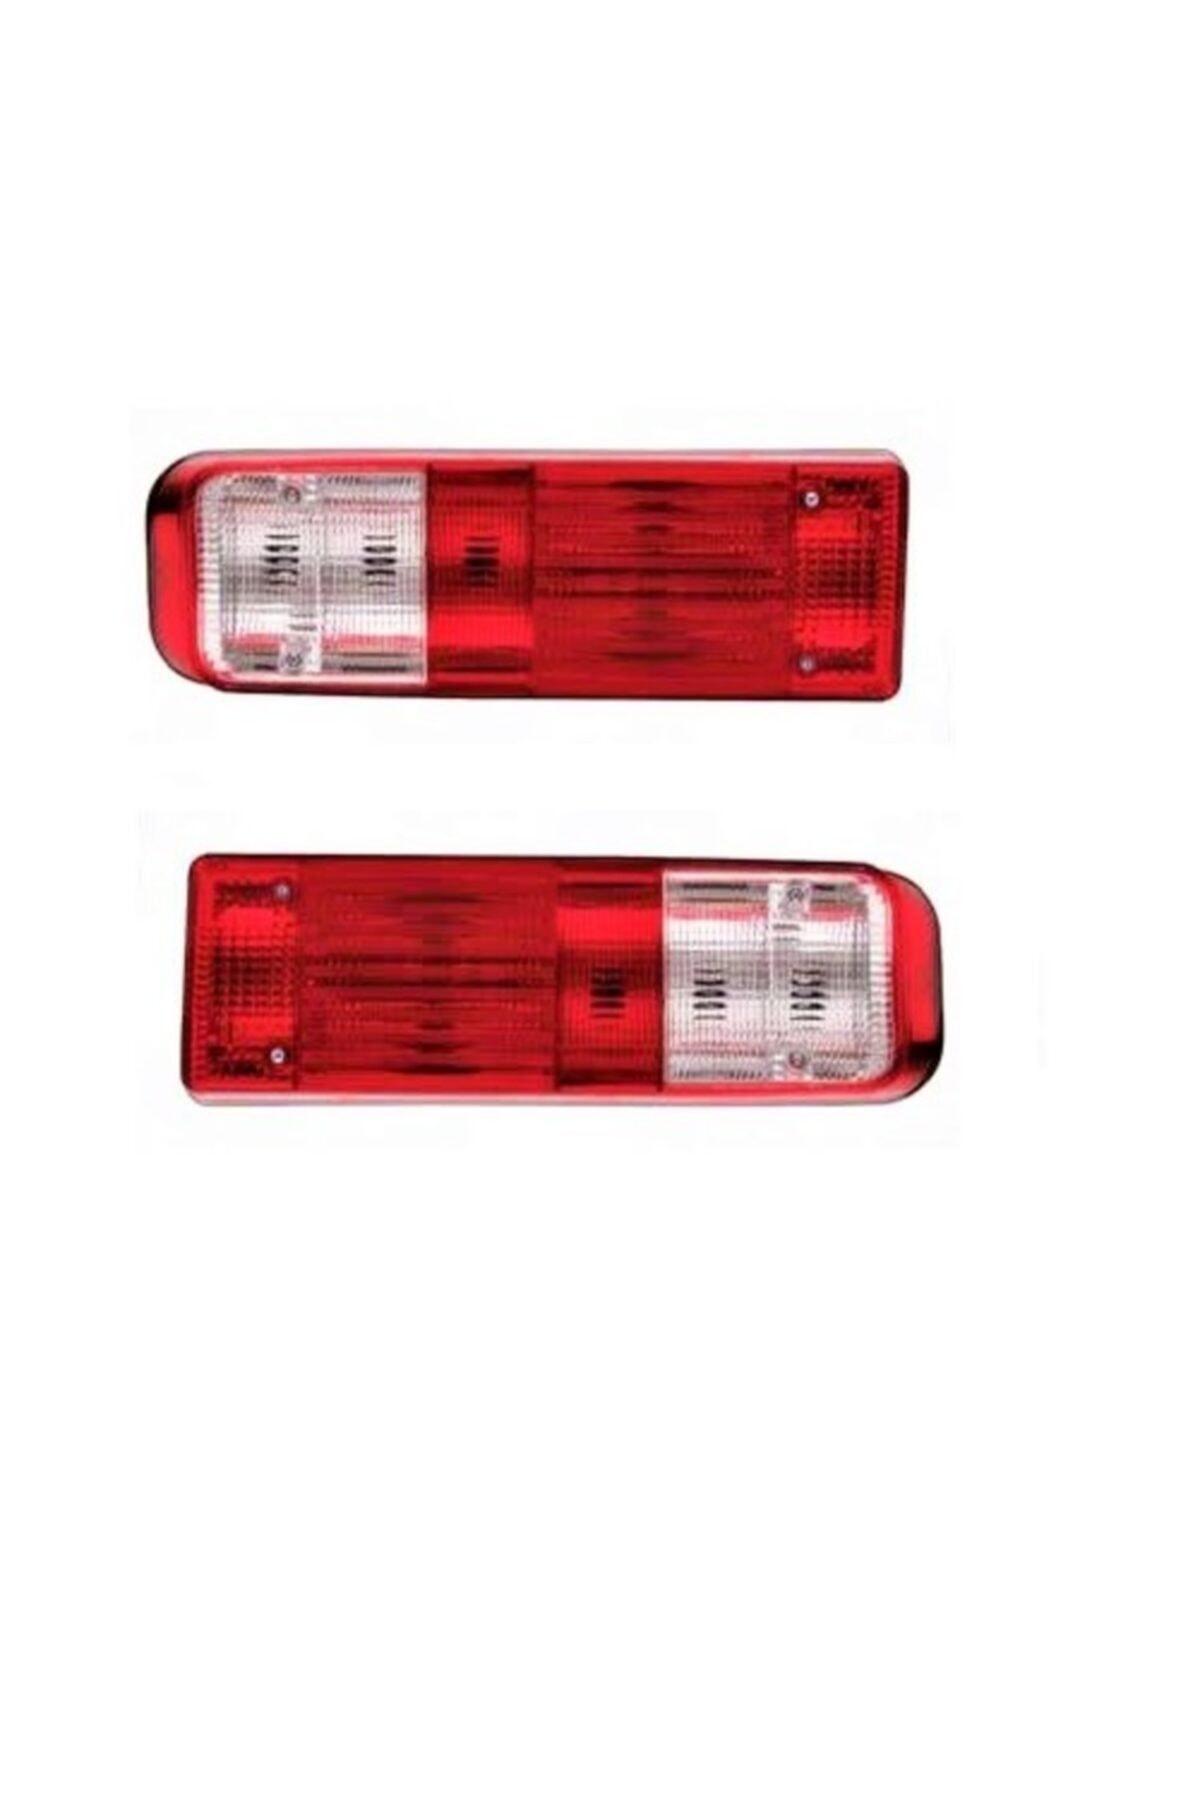 ASFAR Ford Cargo Yeni Model Kablolu Stop Lamba  2 Adet 1